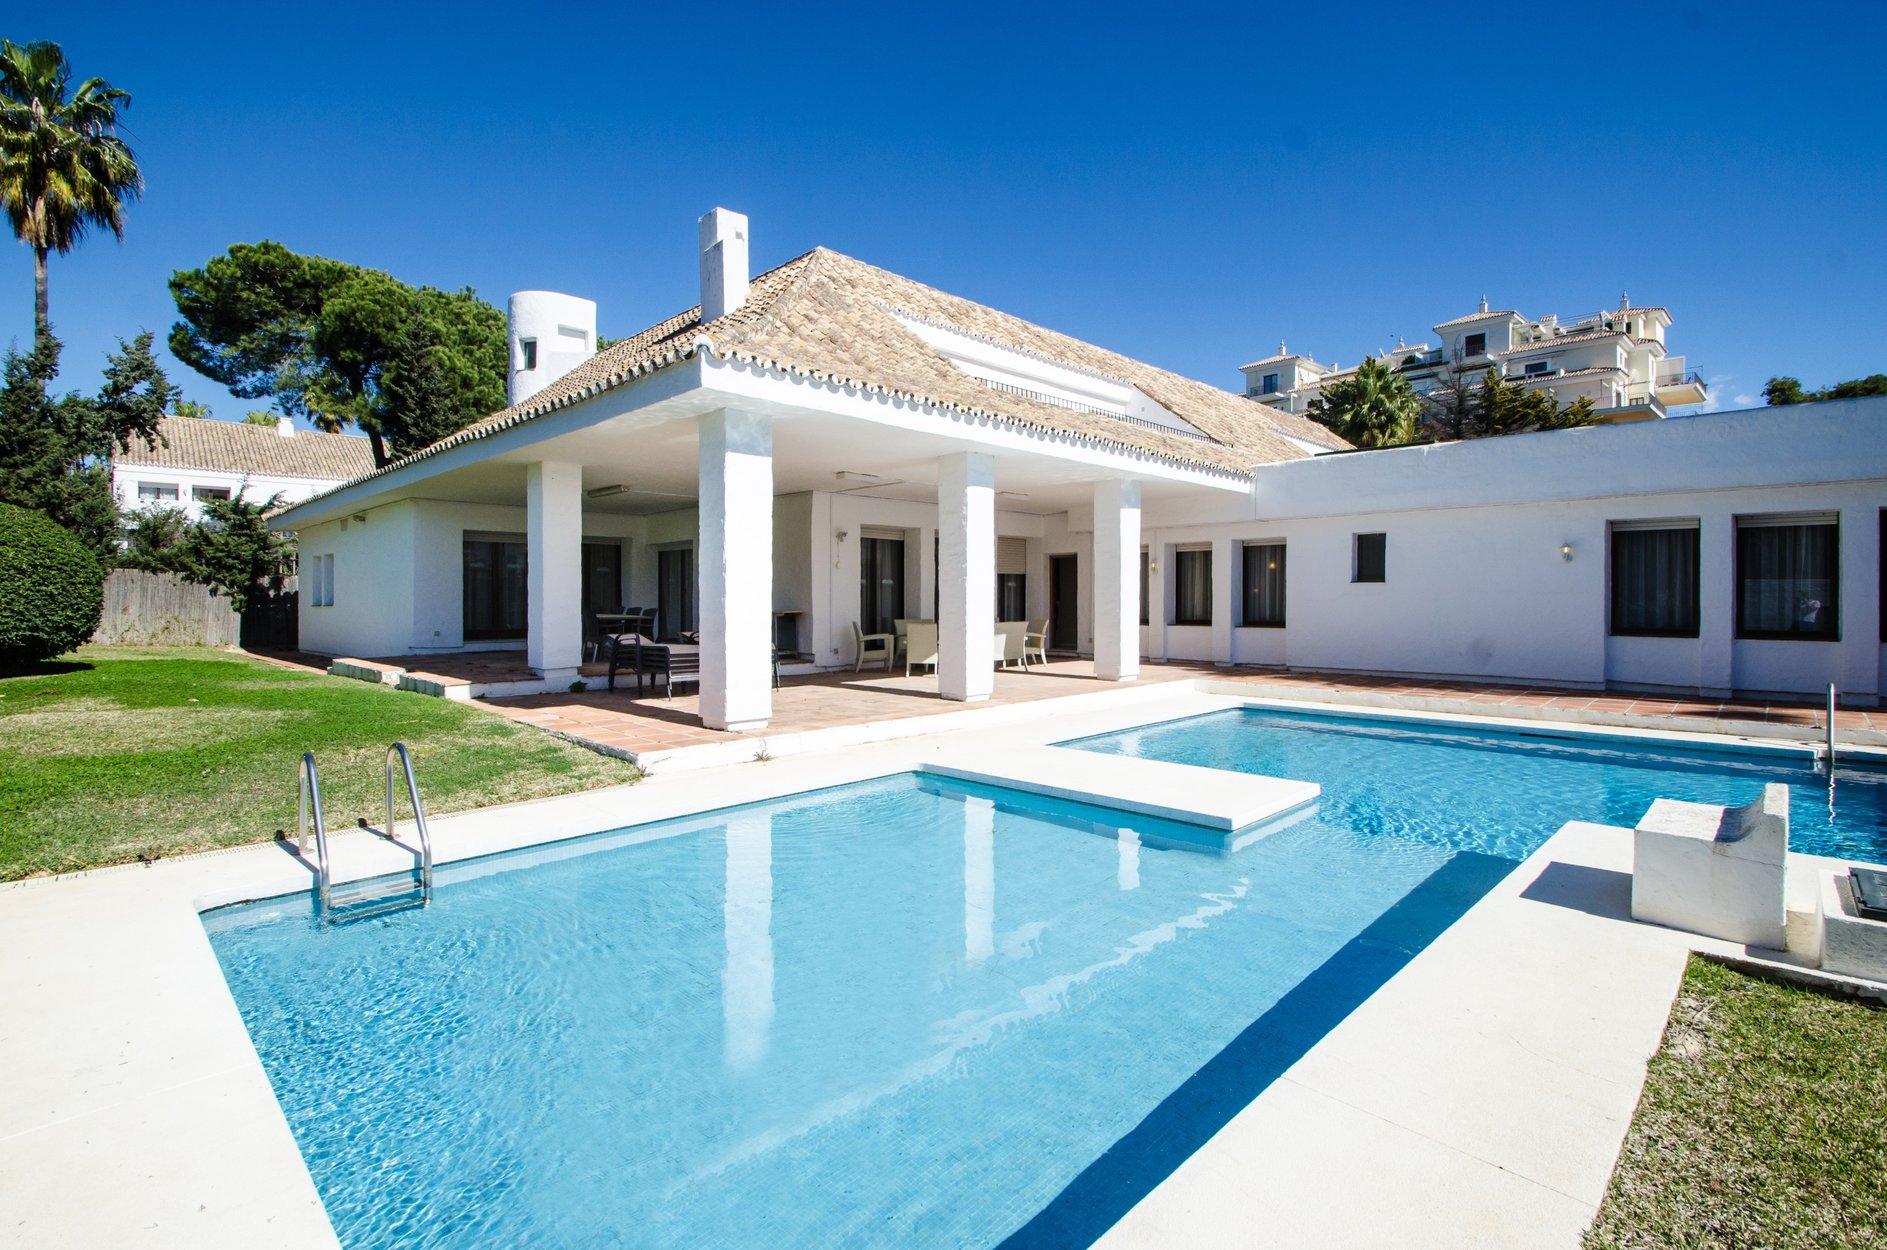 aaa6 Комнатный Дом в Puerto Banus, Marbella | M156599